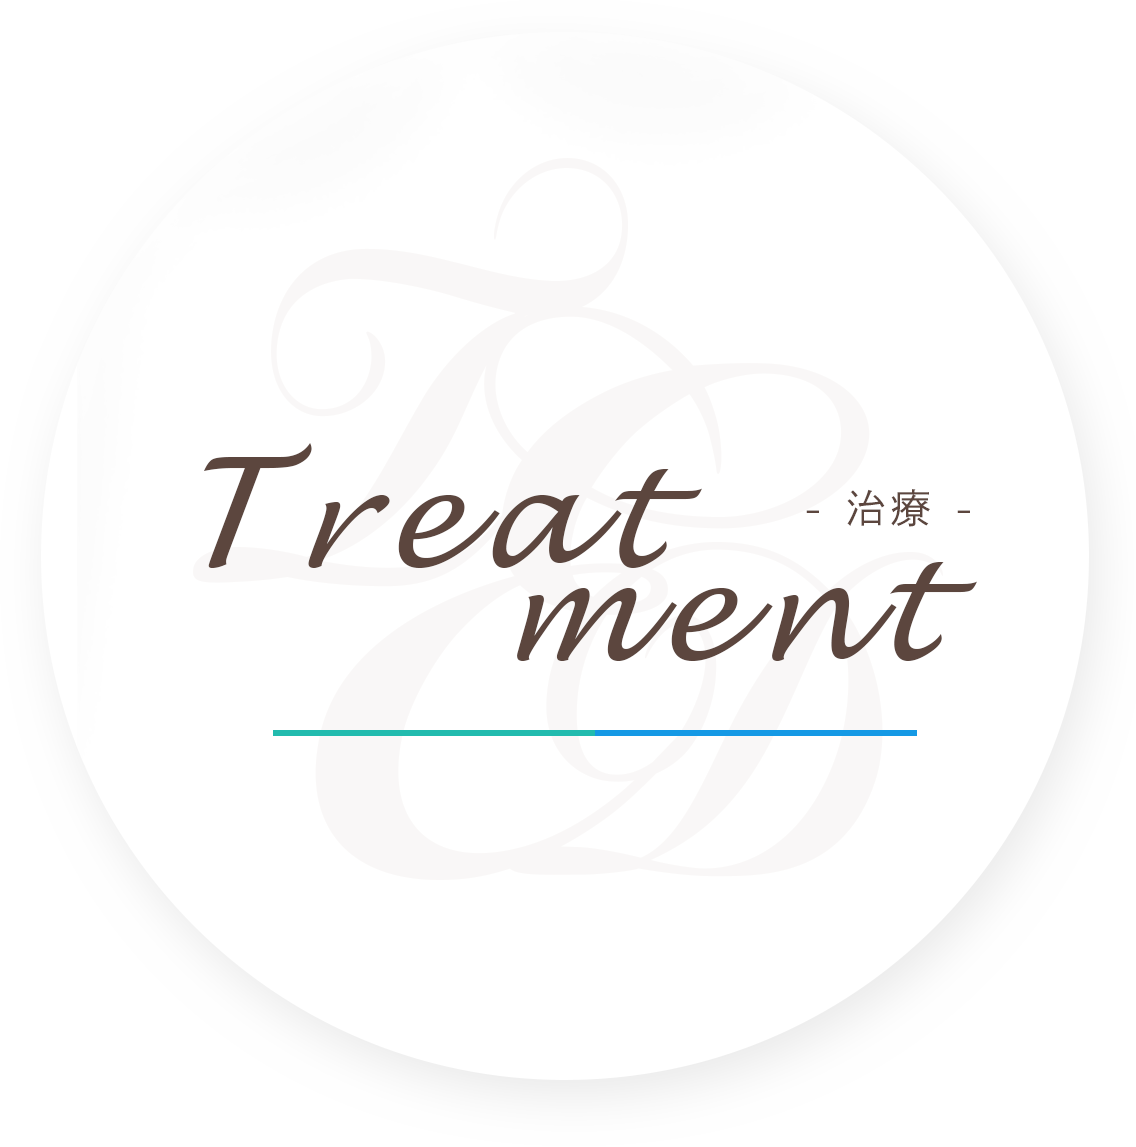 Treatment - 治療 -